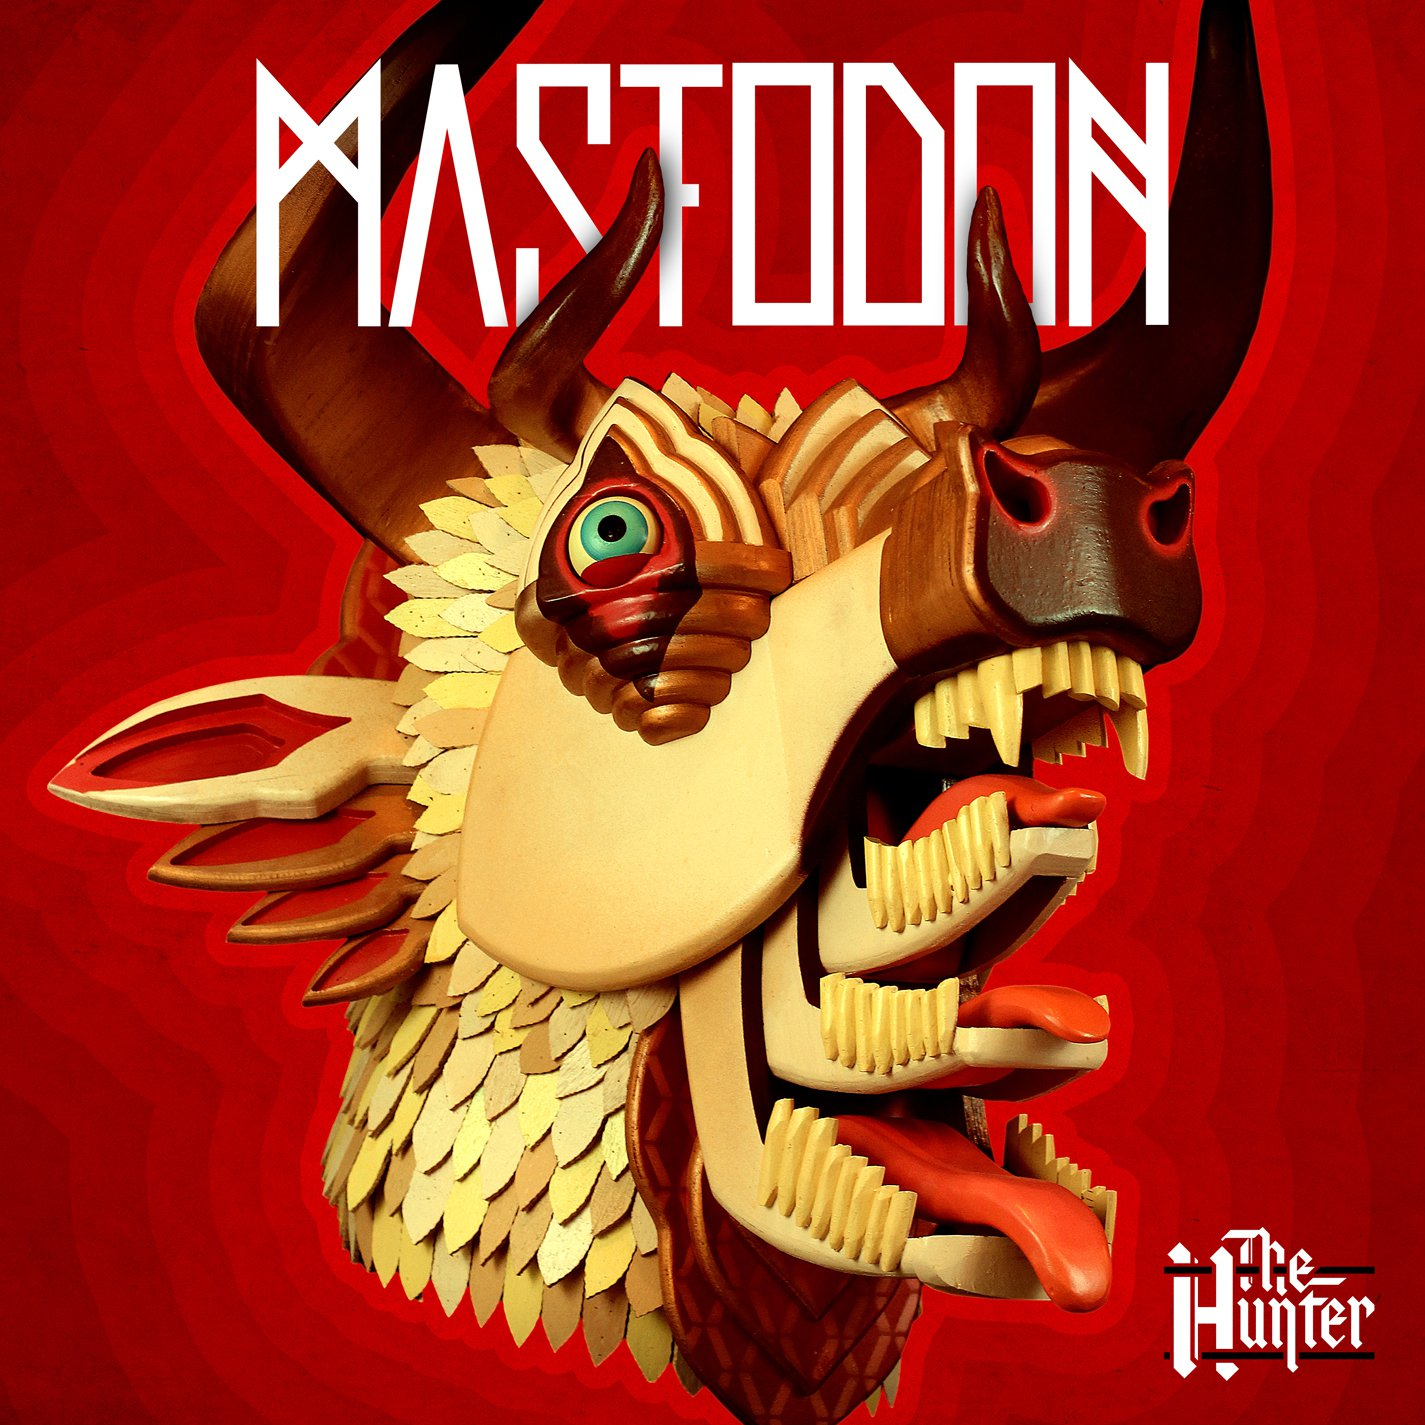 http://1.bp.blogspot.com/-HKPPbawcJSY/ThqRez75MxI/AAAAAAAAHQw/F_4EMaczPdA/s1600/Mastodon-TheHunter-albumcover.jpg